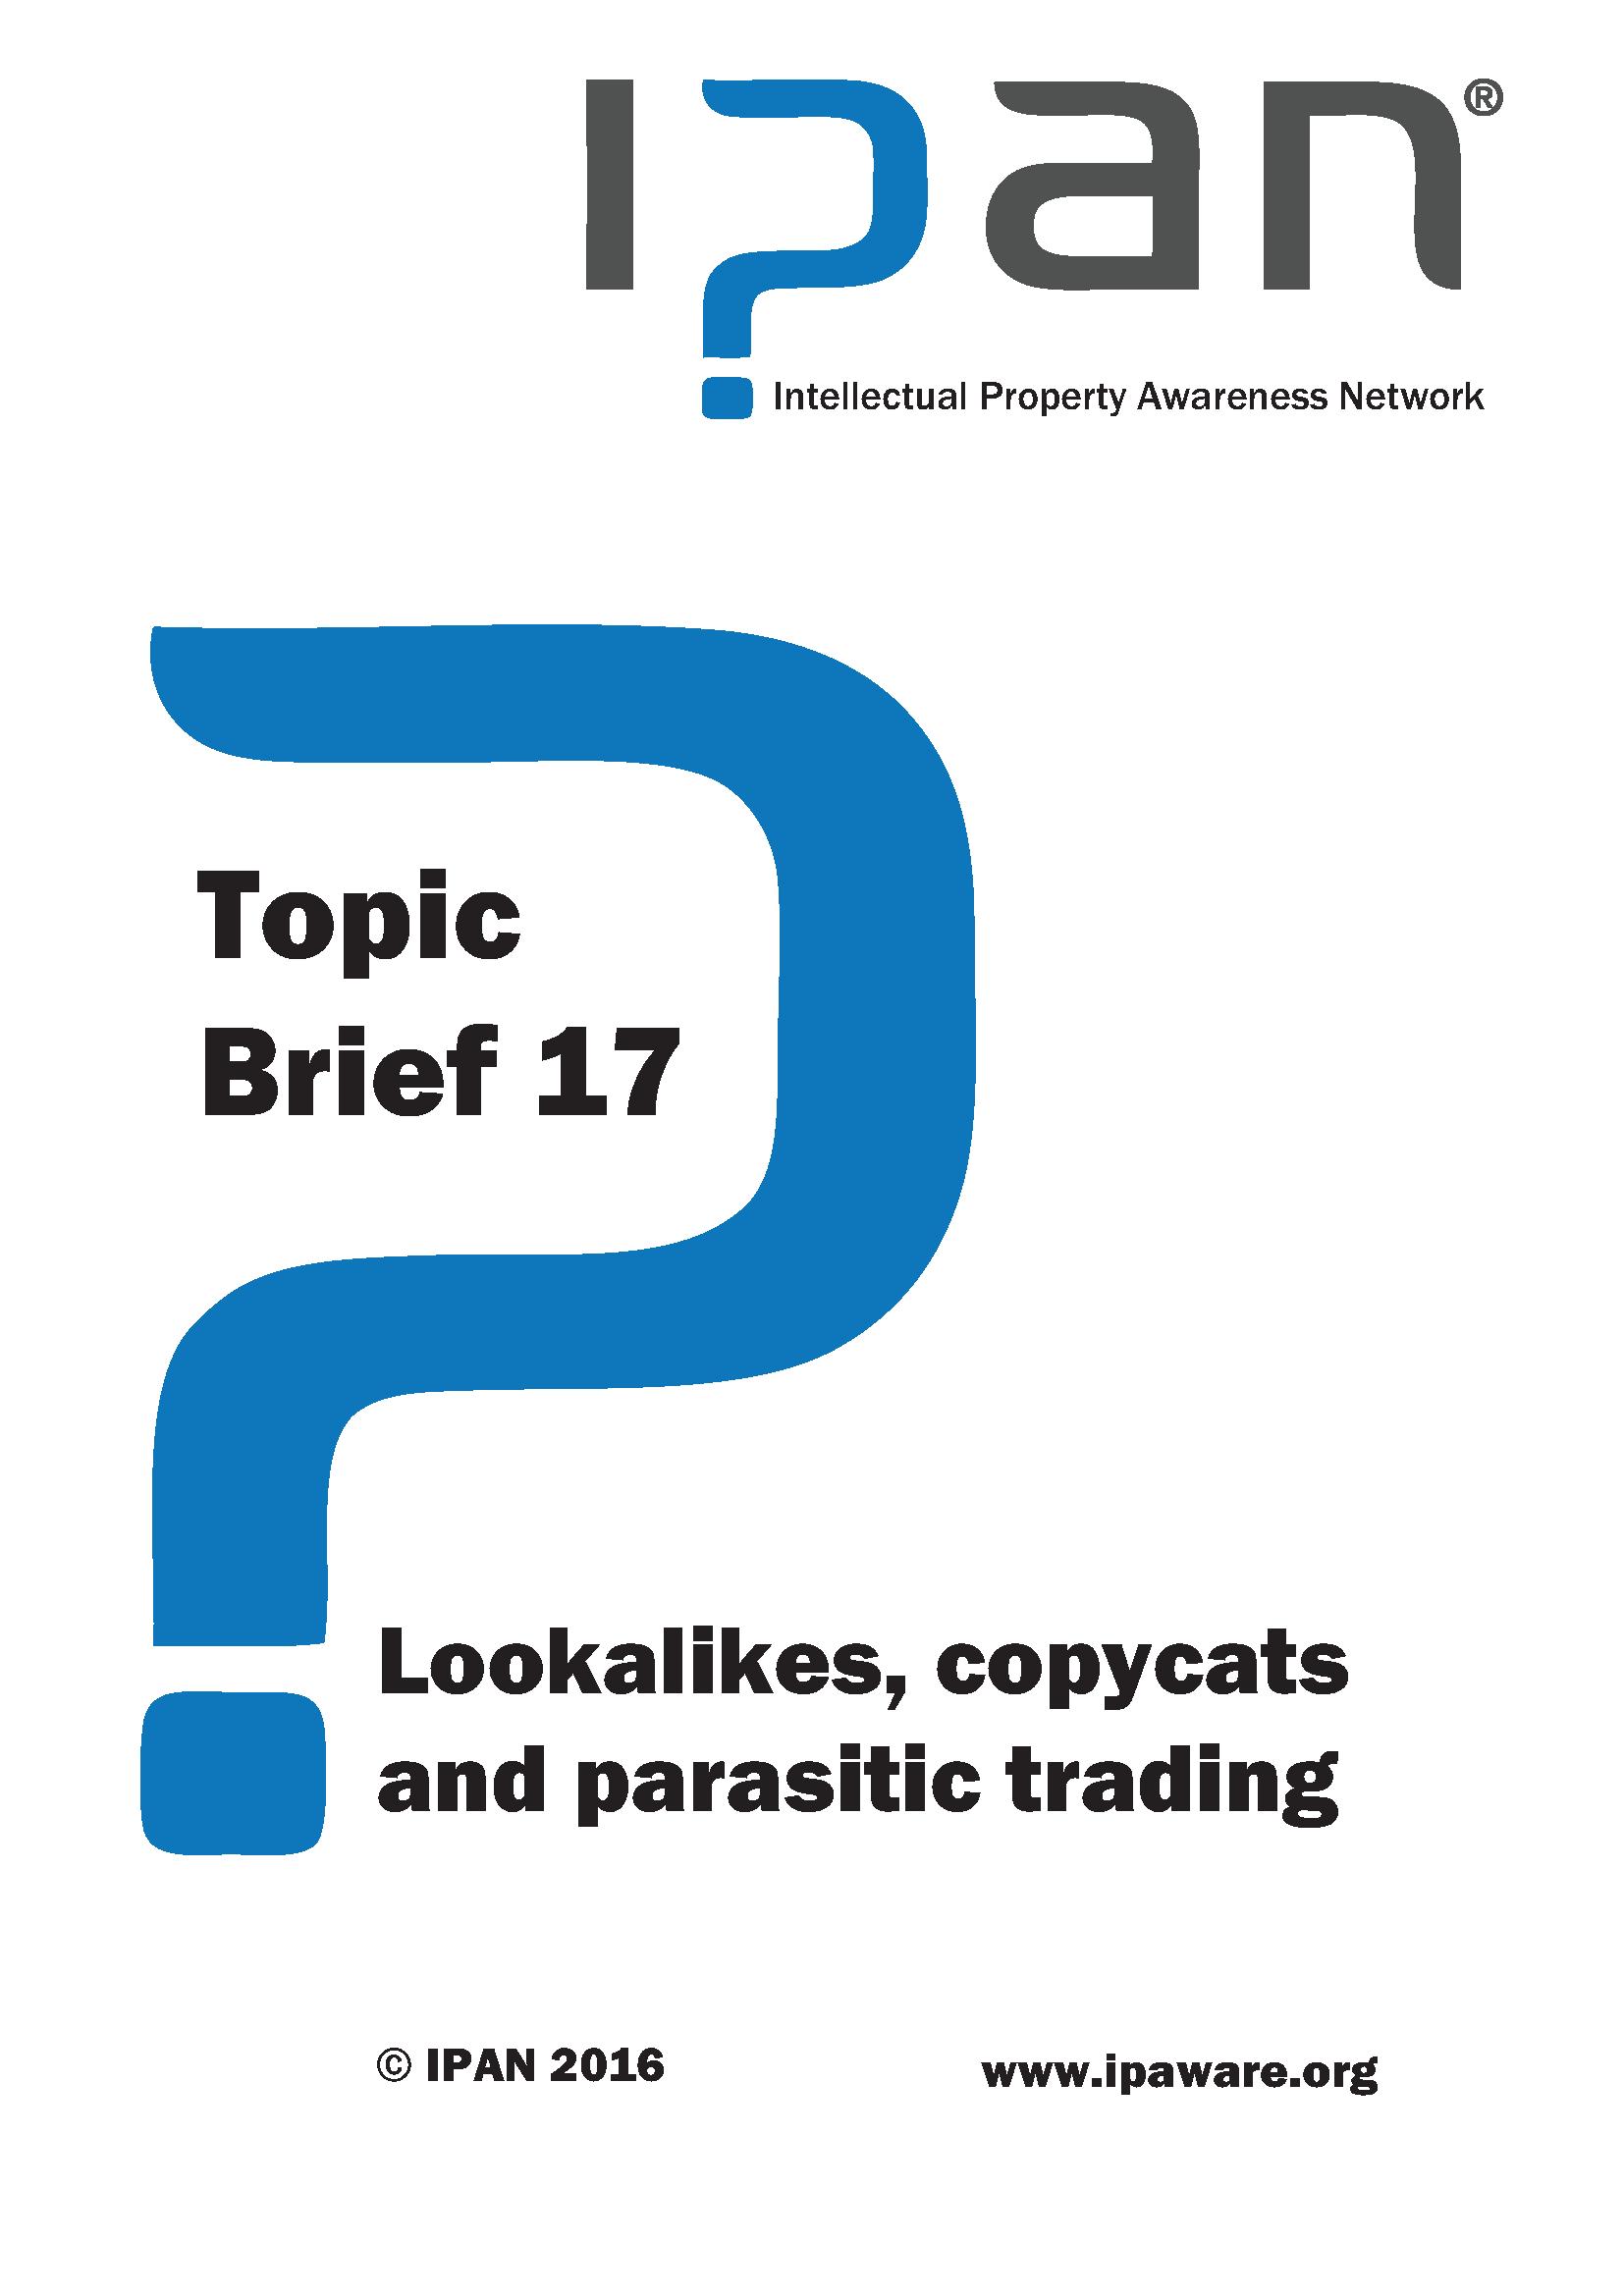 Lookalikes, copycats and parasitic trading